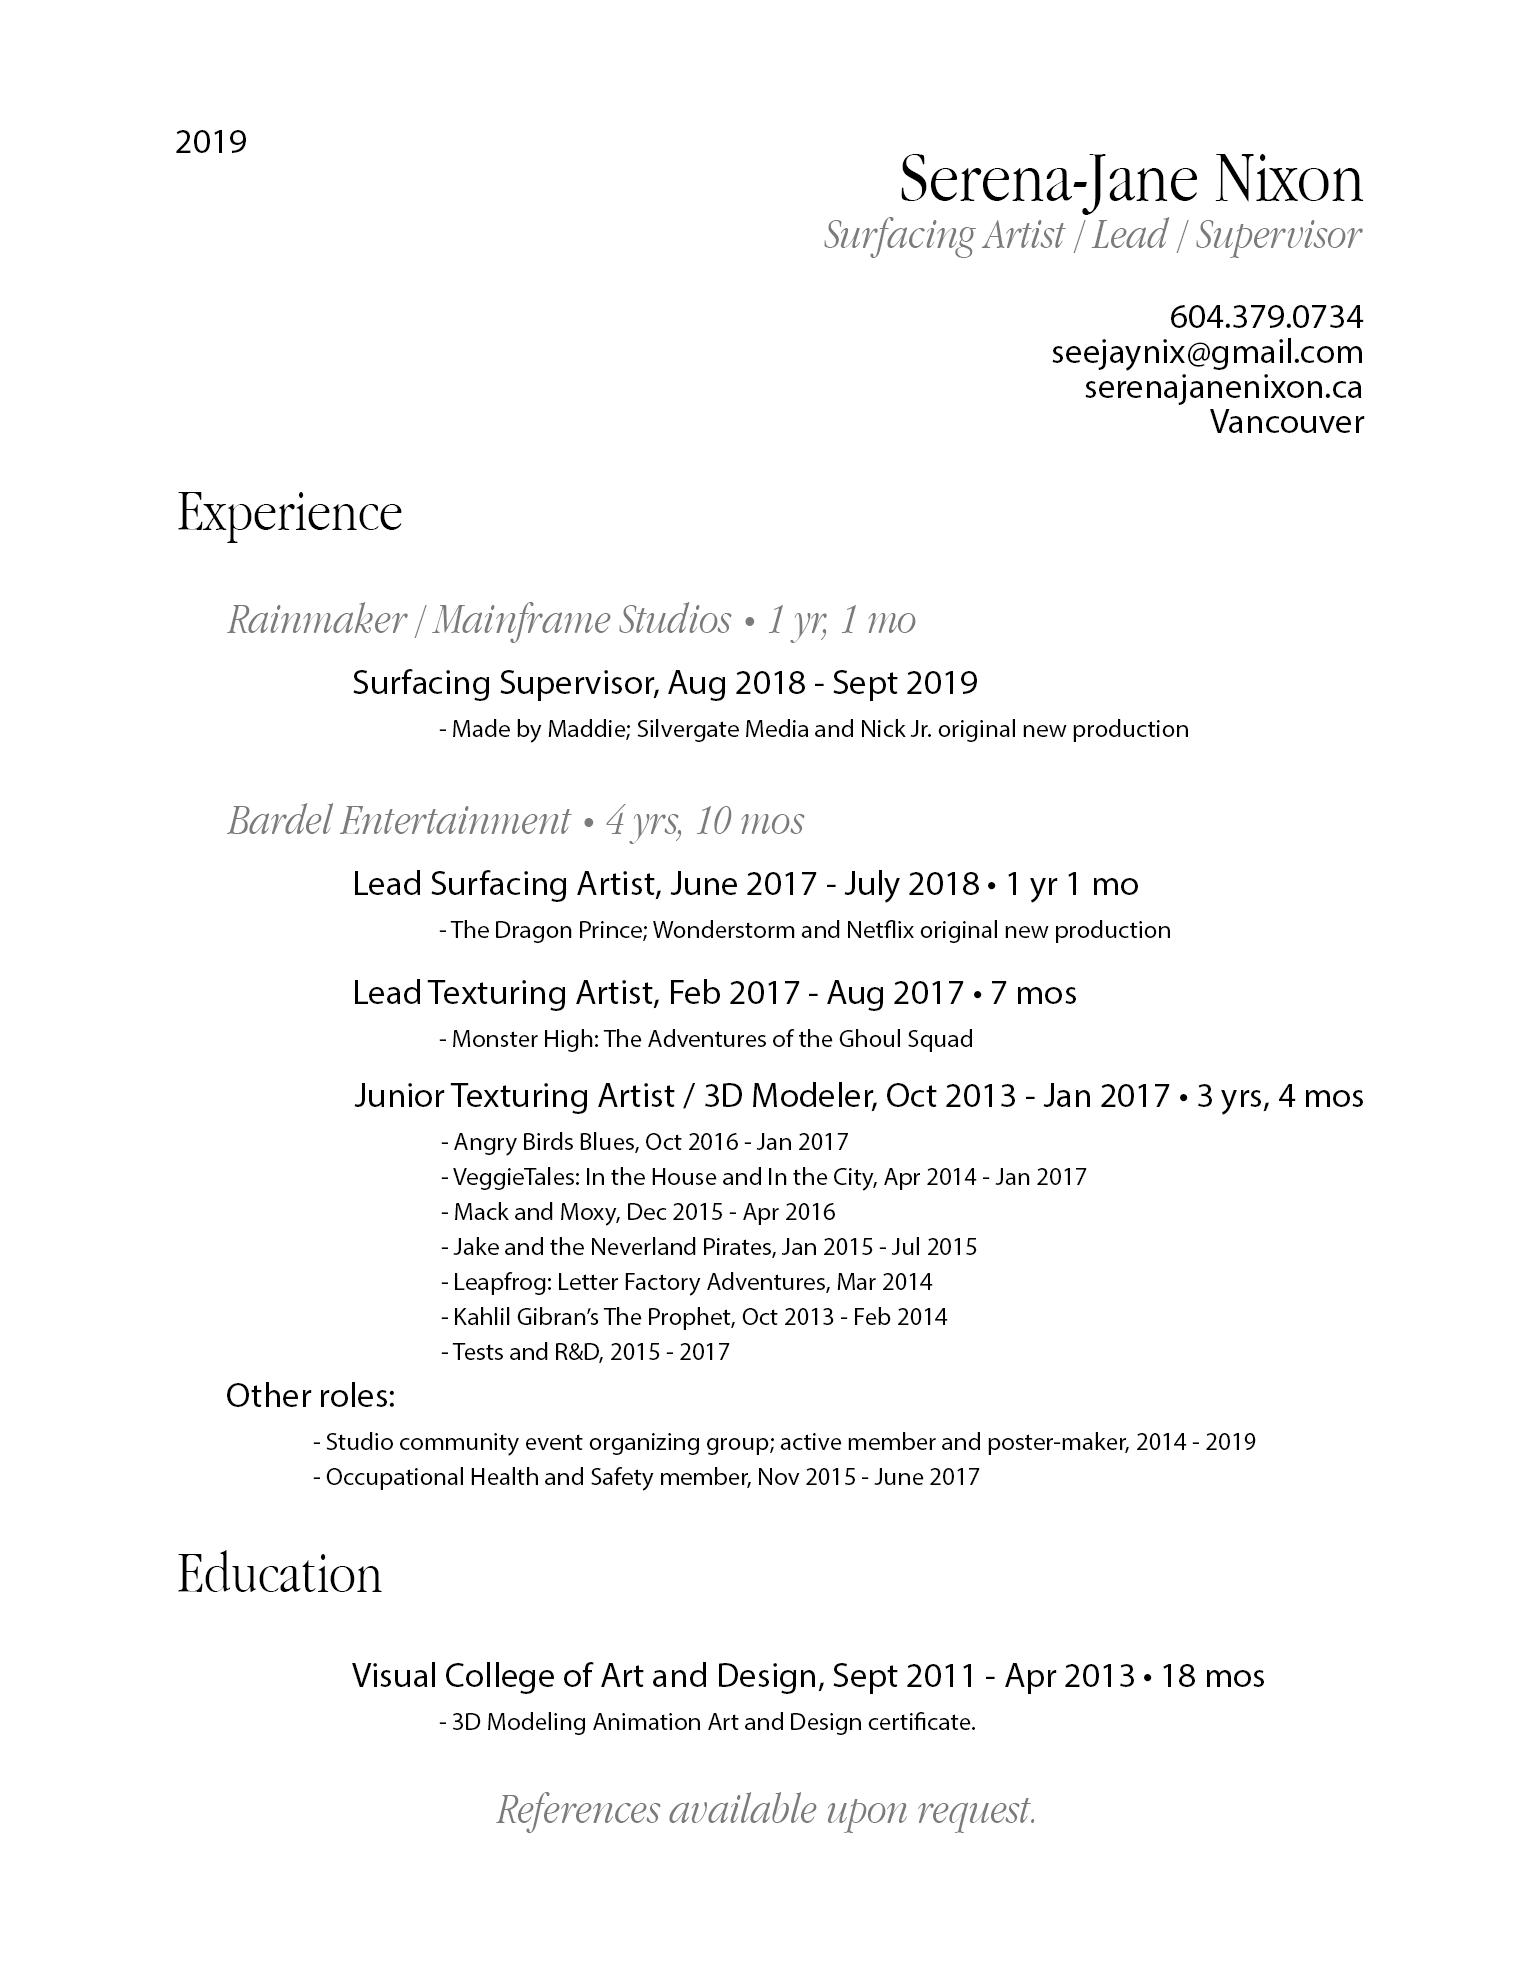 Resume_2019_WEB.png